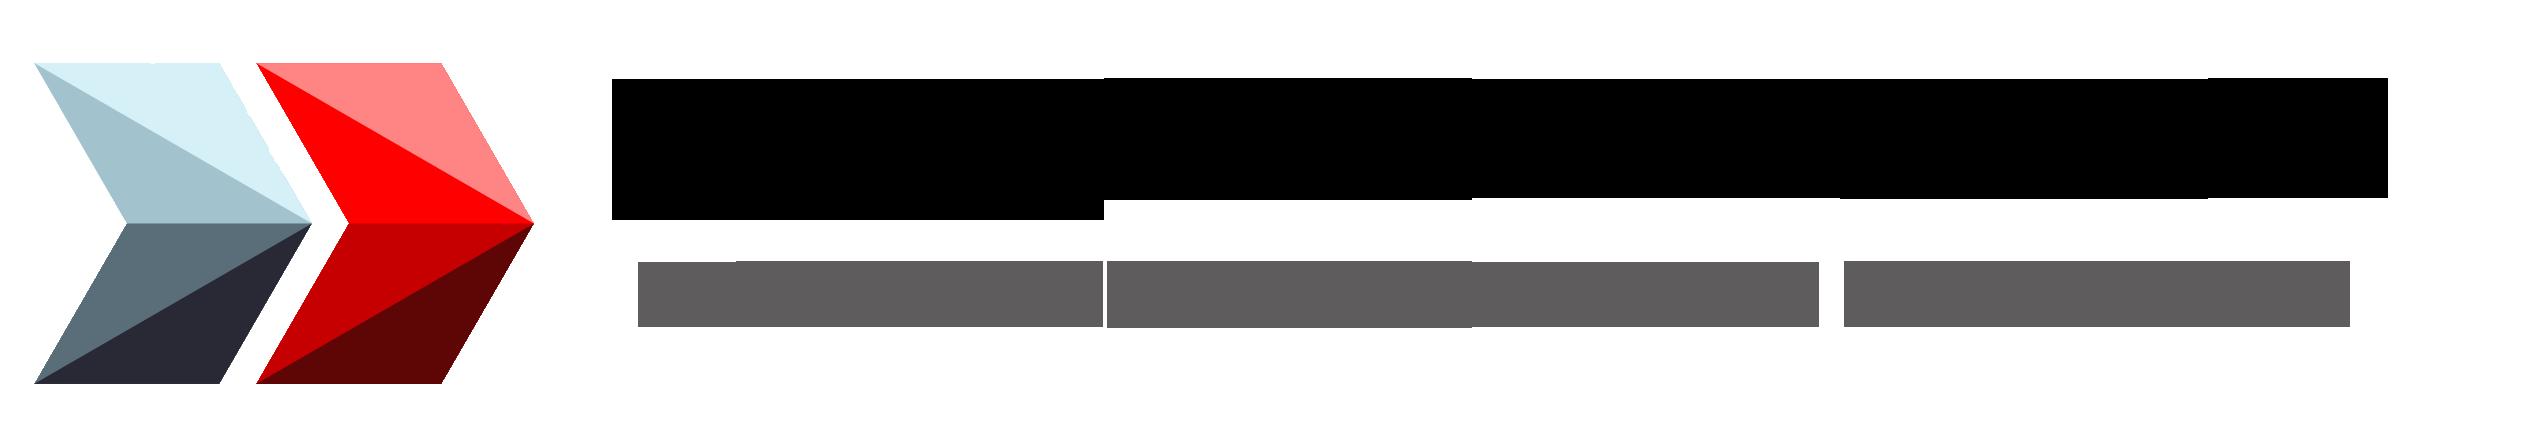 ДЕТЕКТОР ГАЗА №1 - Поставки газоанализаторов